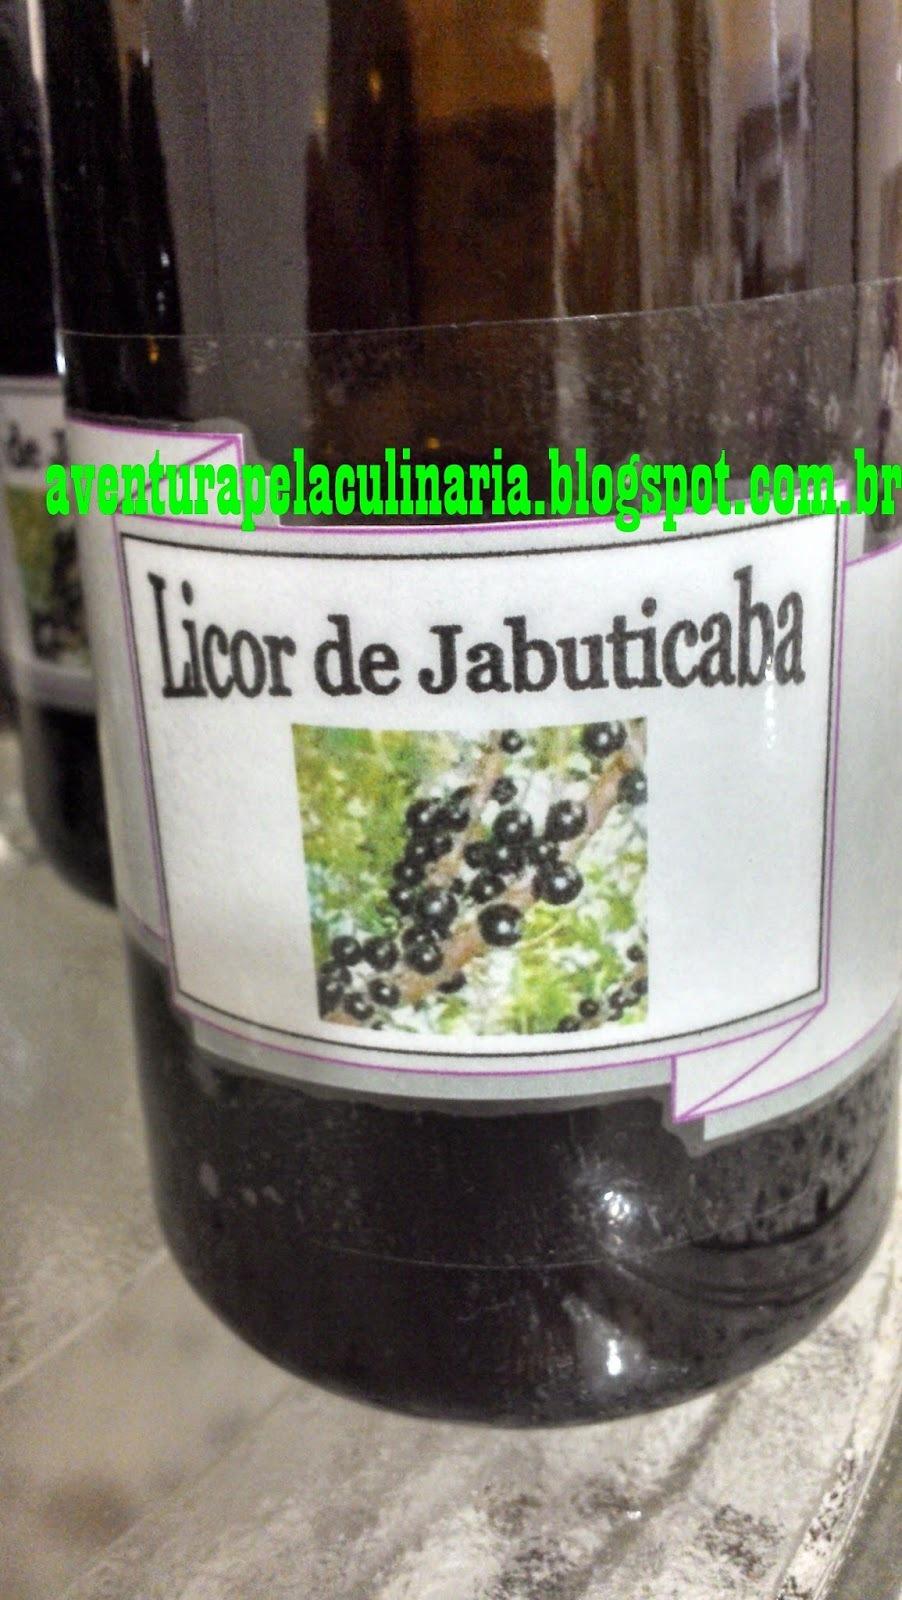 Licor de Jabuticaba